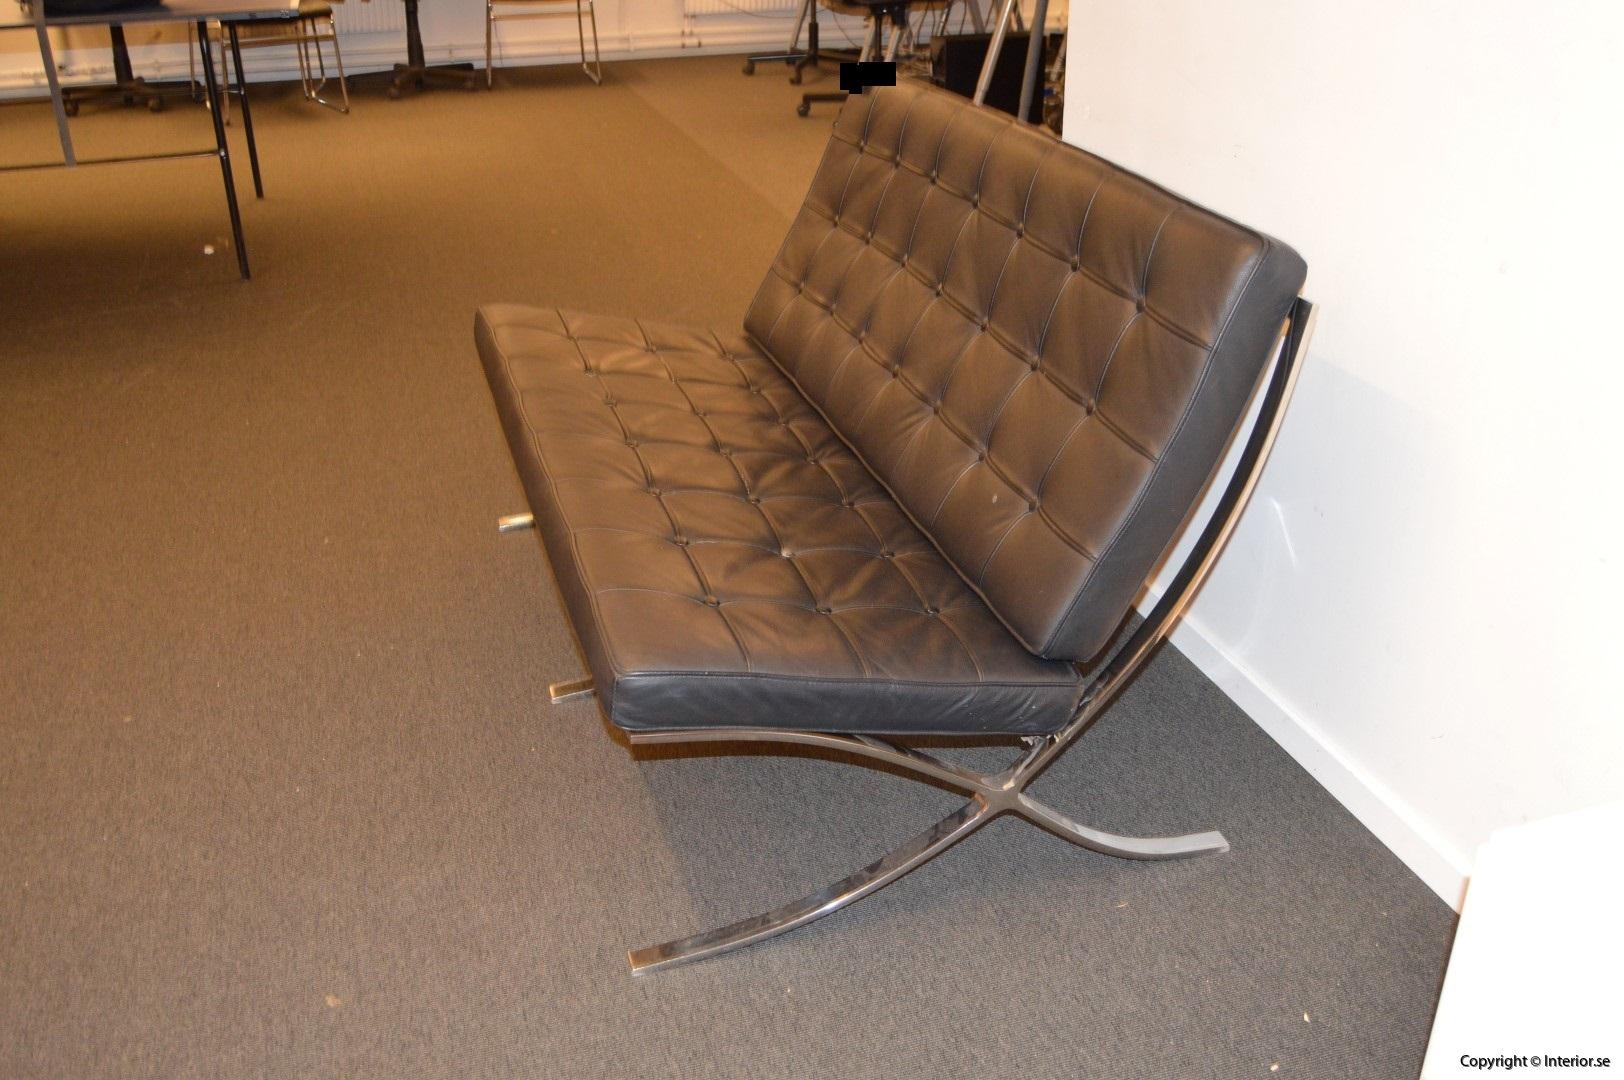 Barcelona soffa hyra möbler stockholm eventmöbler hyr (32)